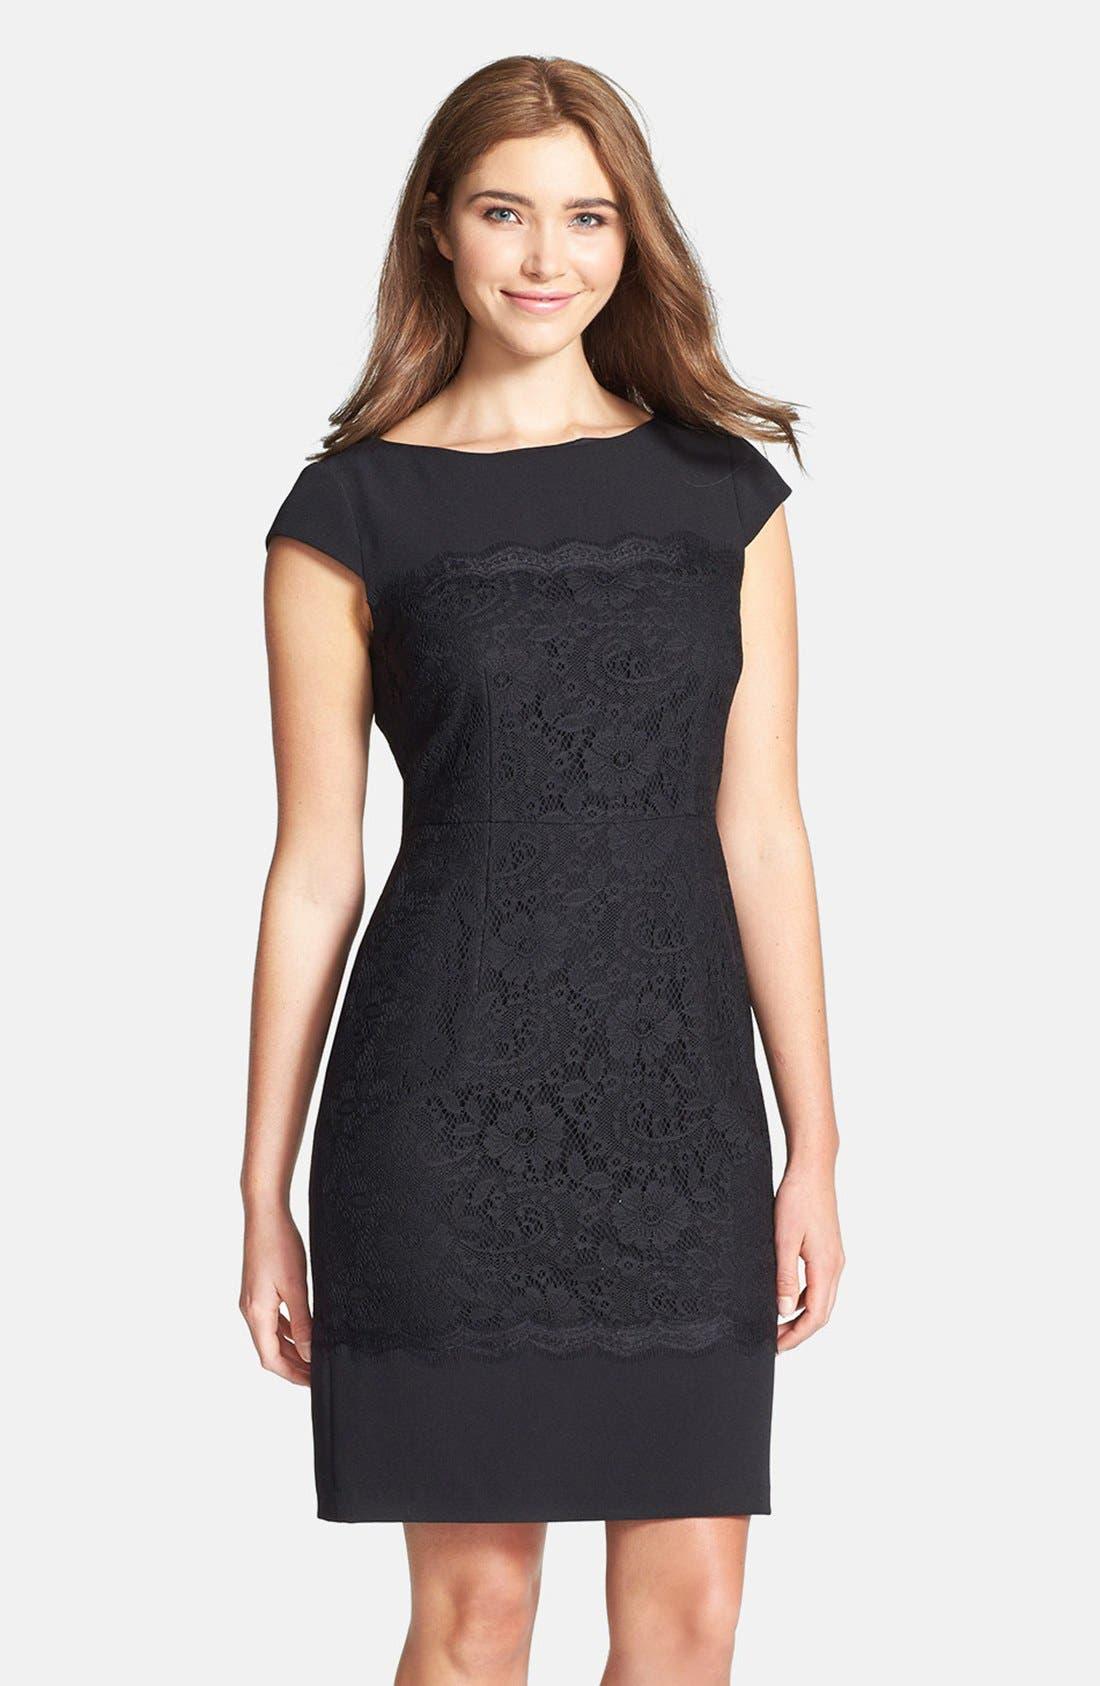 Alternate Image 1 Selected - Adrianna Papell Scalloped Lace Sheath Dress (Regular & Petite)